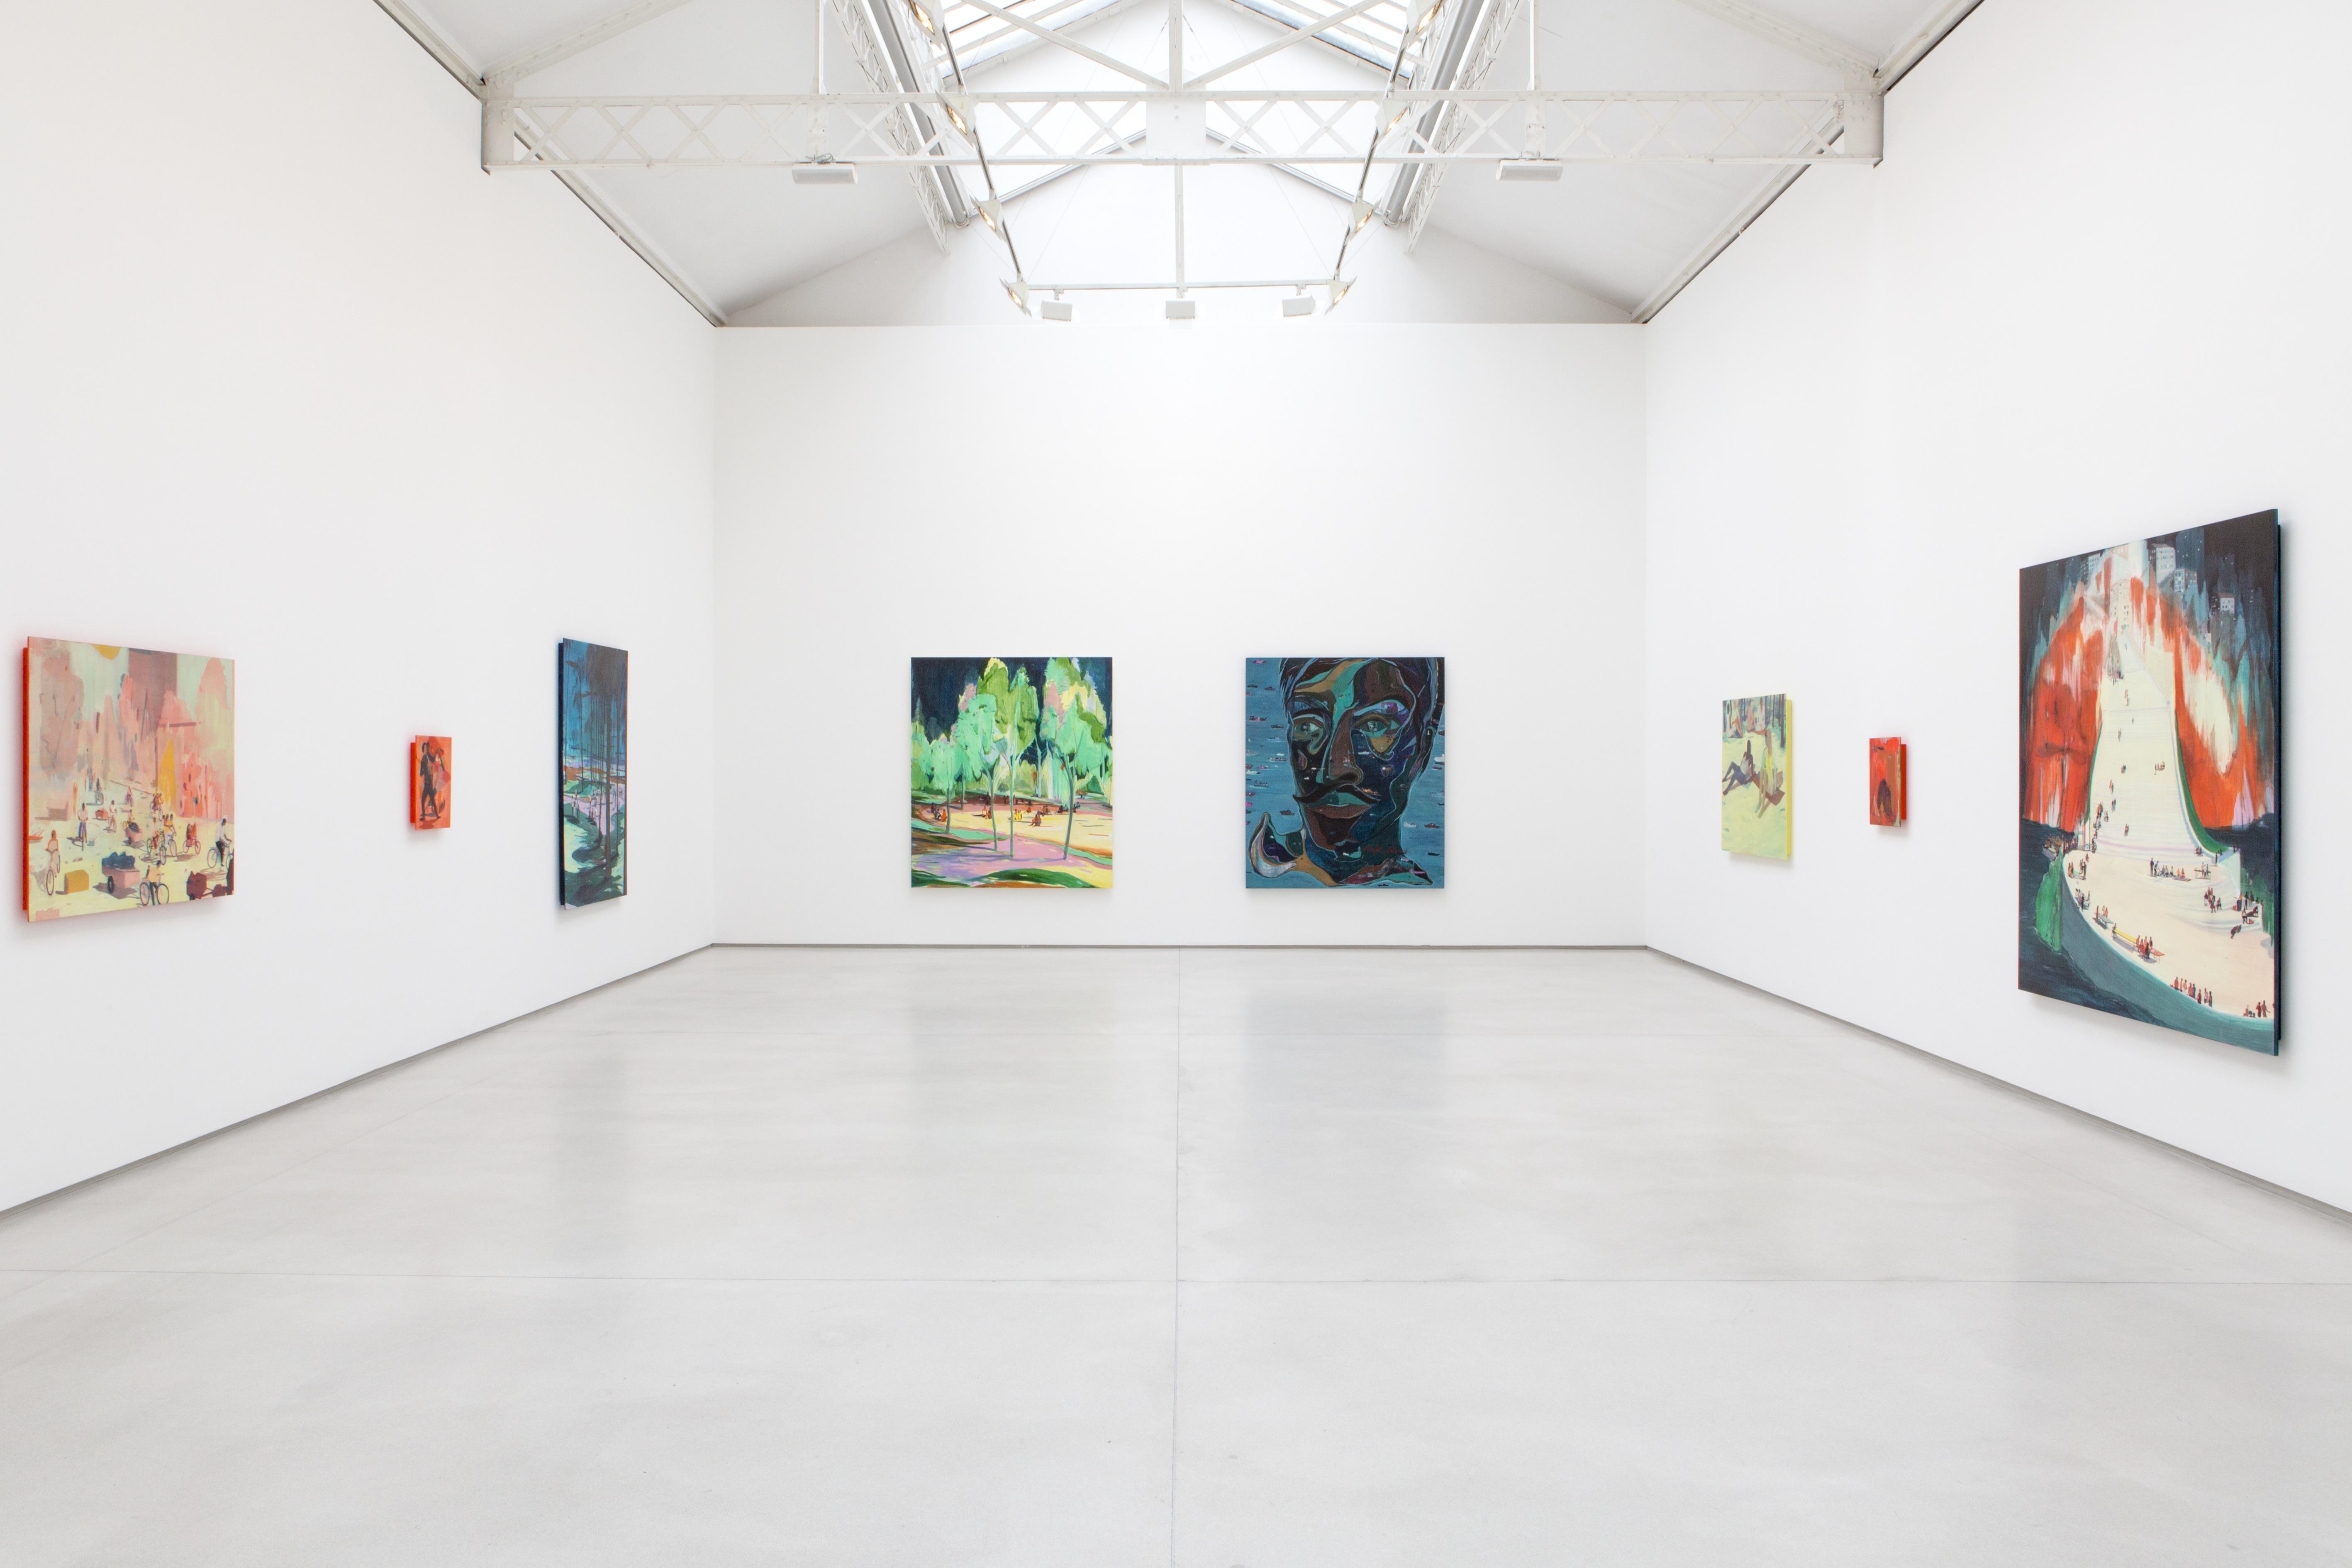 Jules de Balincourt%252C Galerie Thaddaeus Ropac%252C exposition